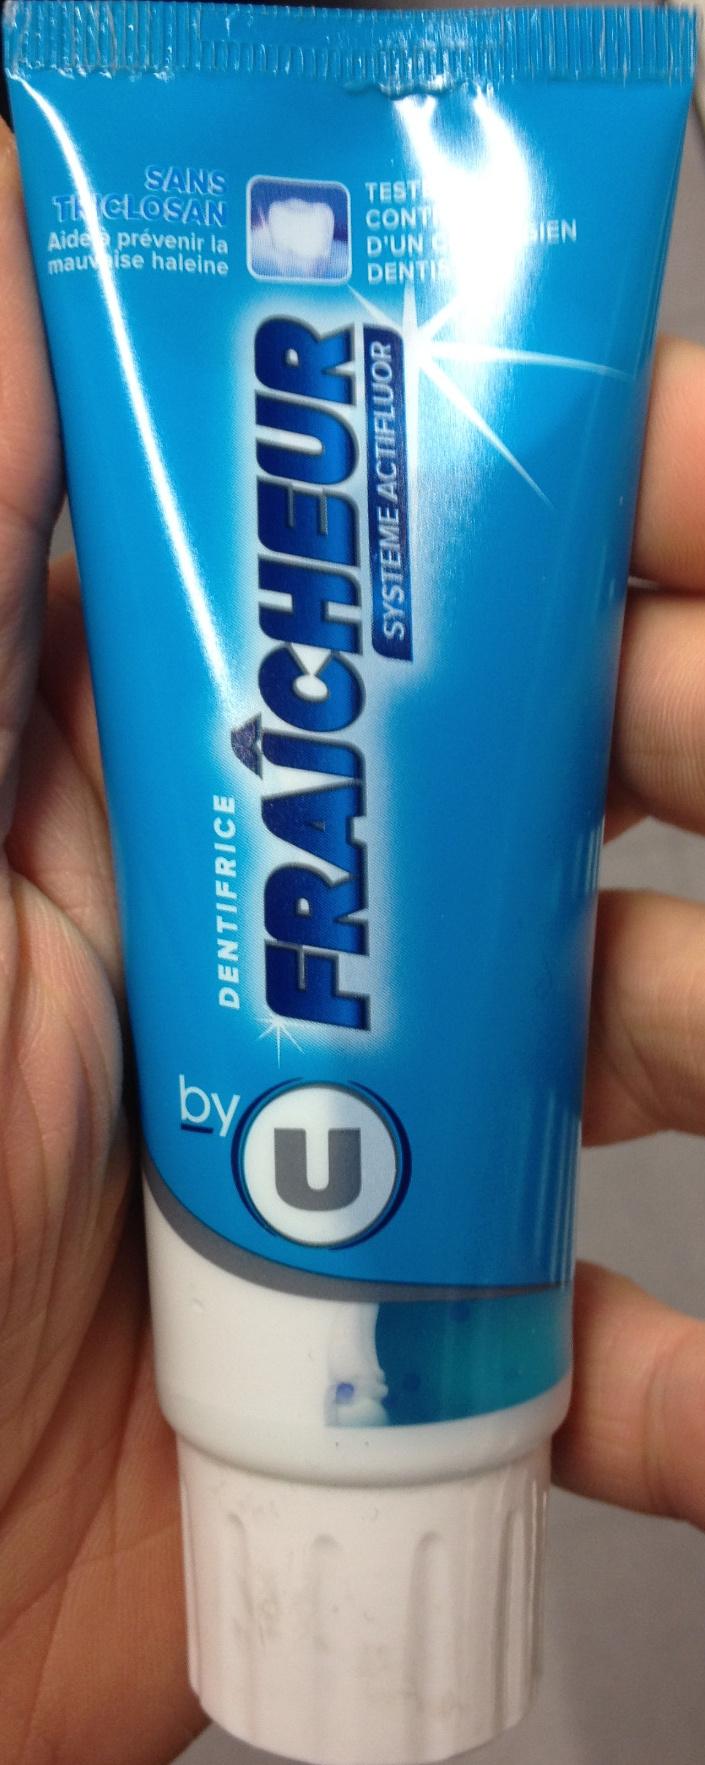 Dentifrice Fraîcheur - Product - fr